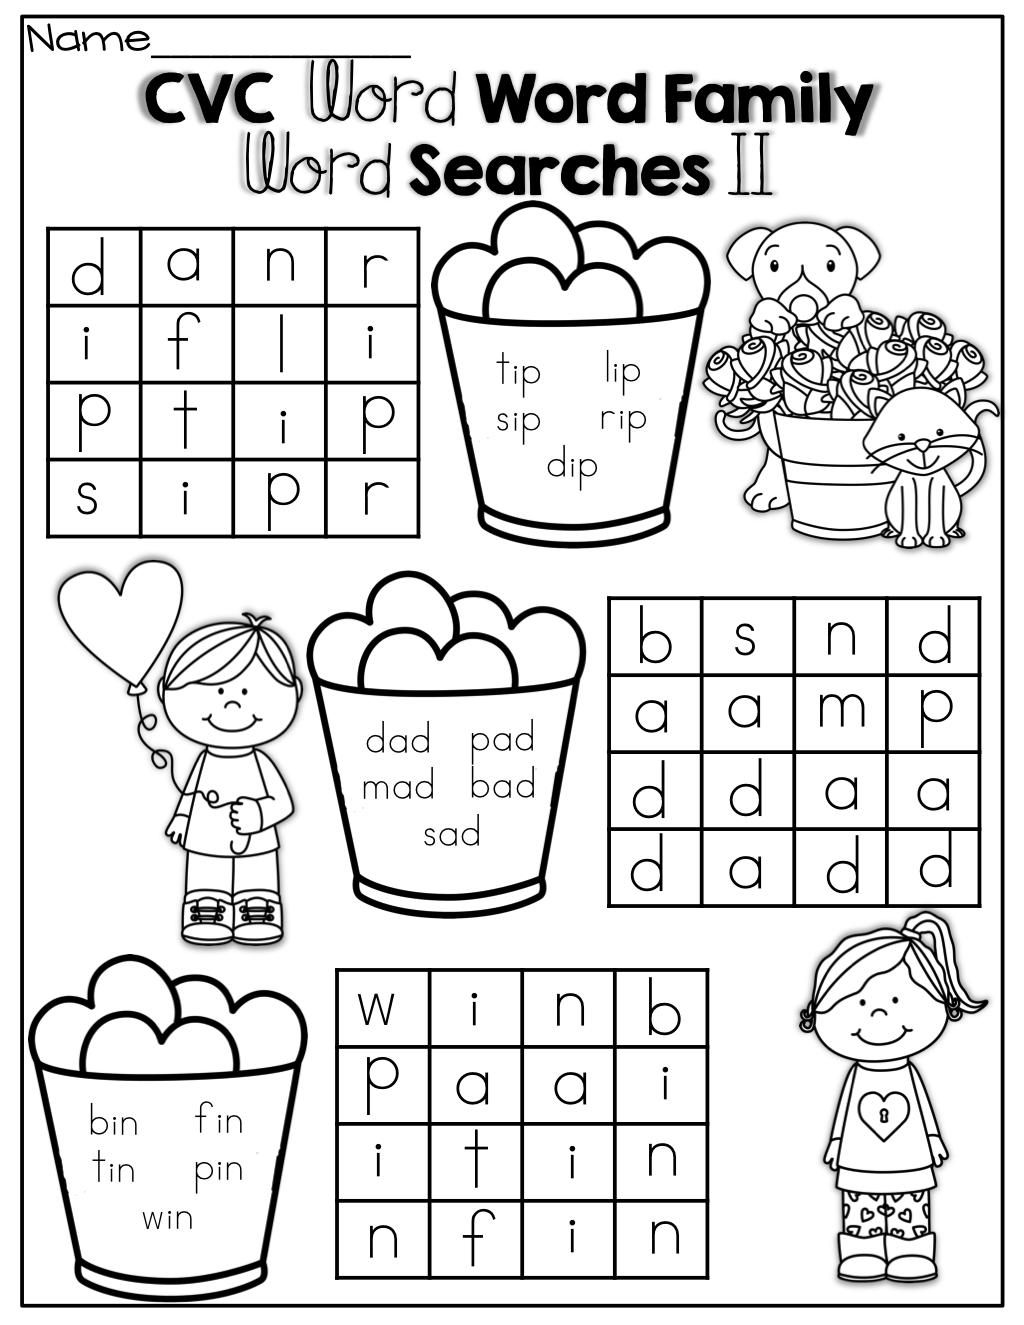 Simple Cvc Word Family Word Search! | Kindergarten Literacy